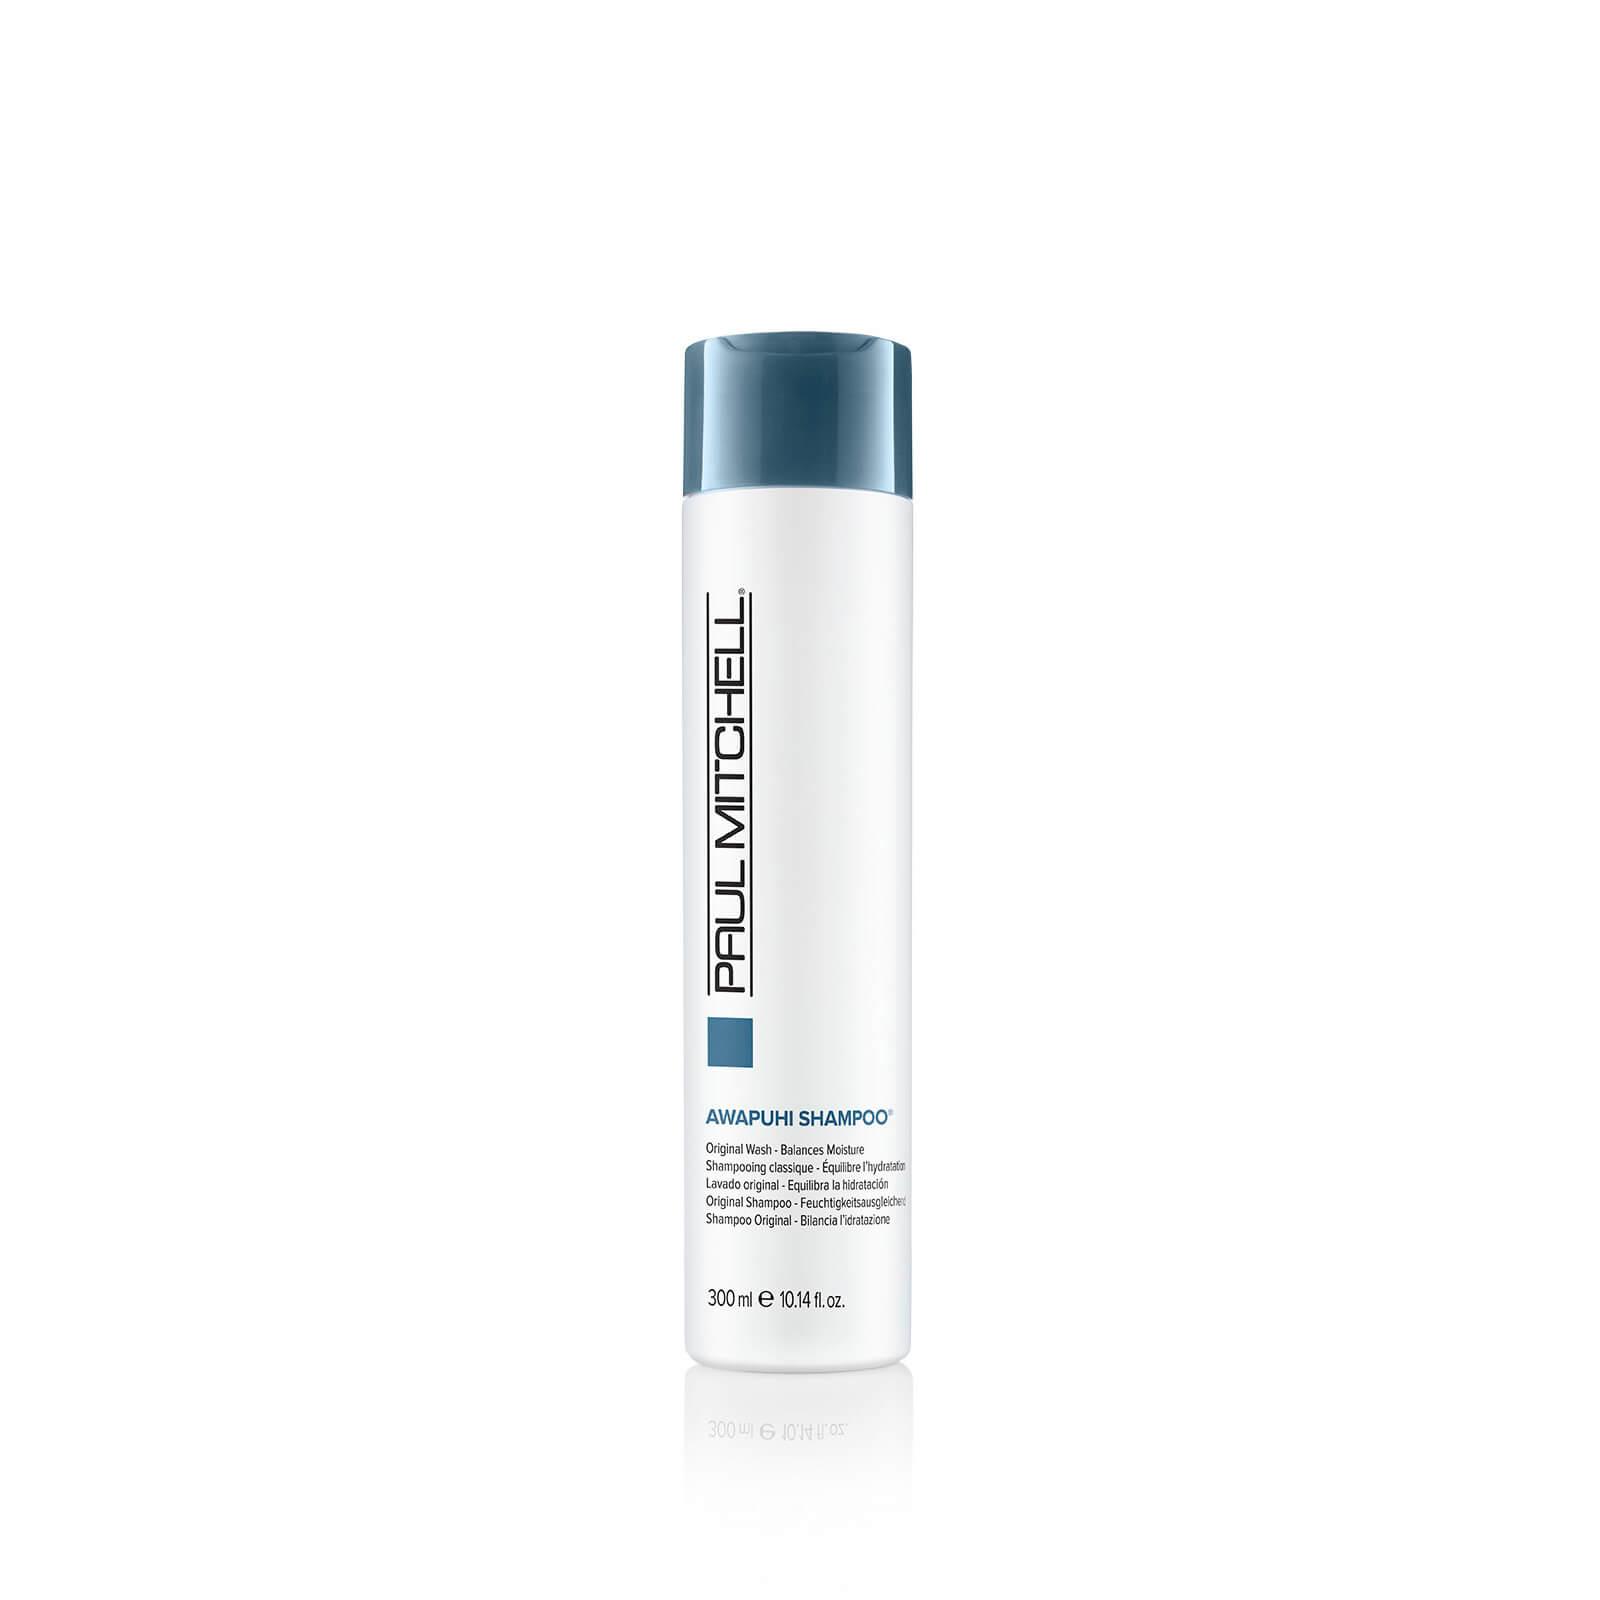 Купить Paul Mitchell Awapuhi Shampoo (300ml)